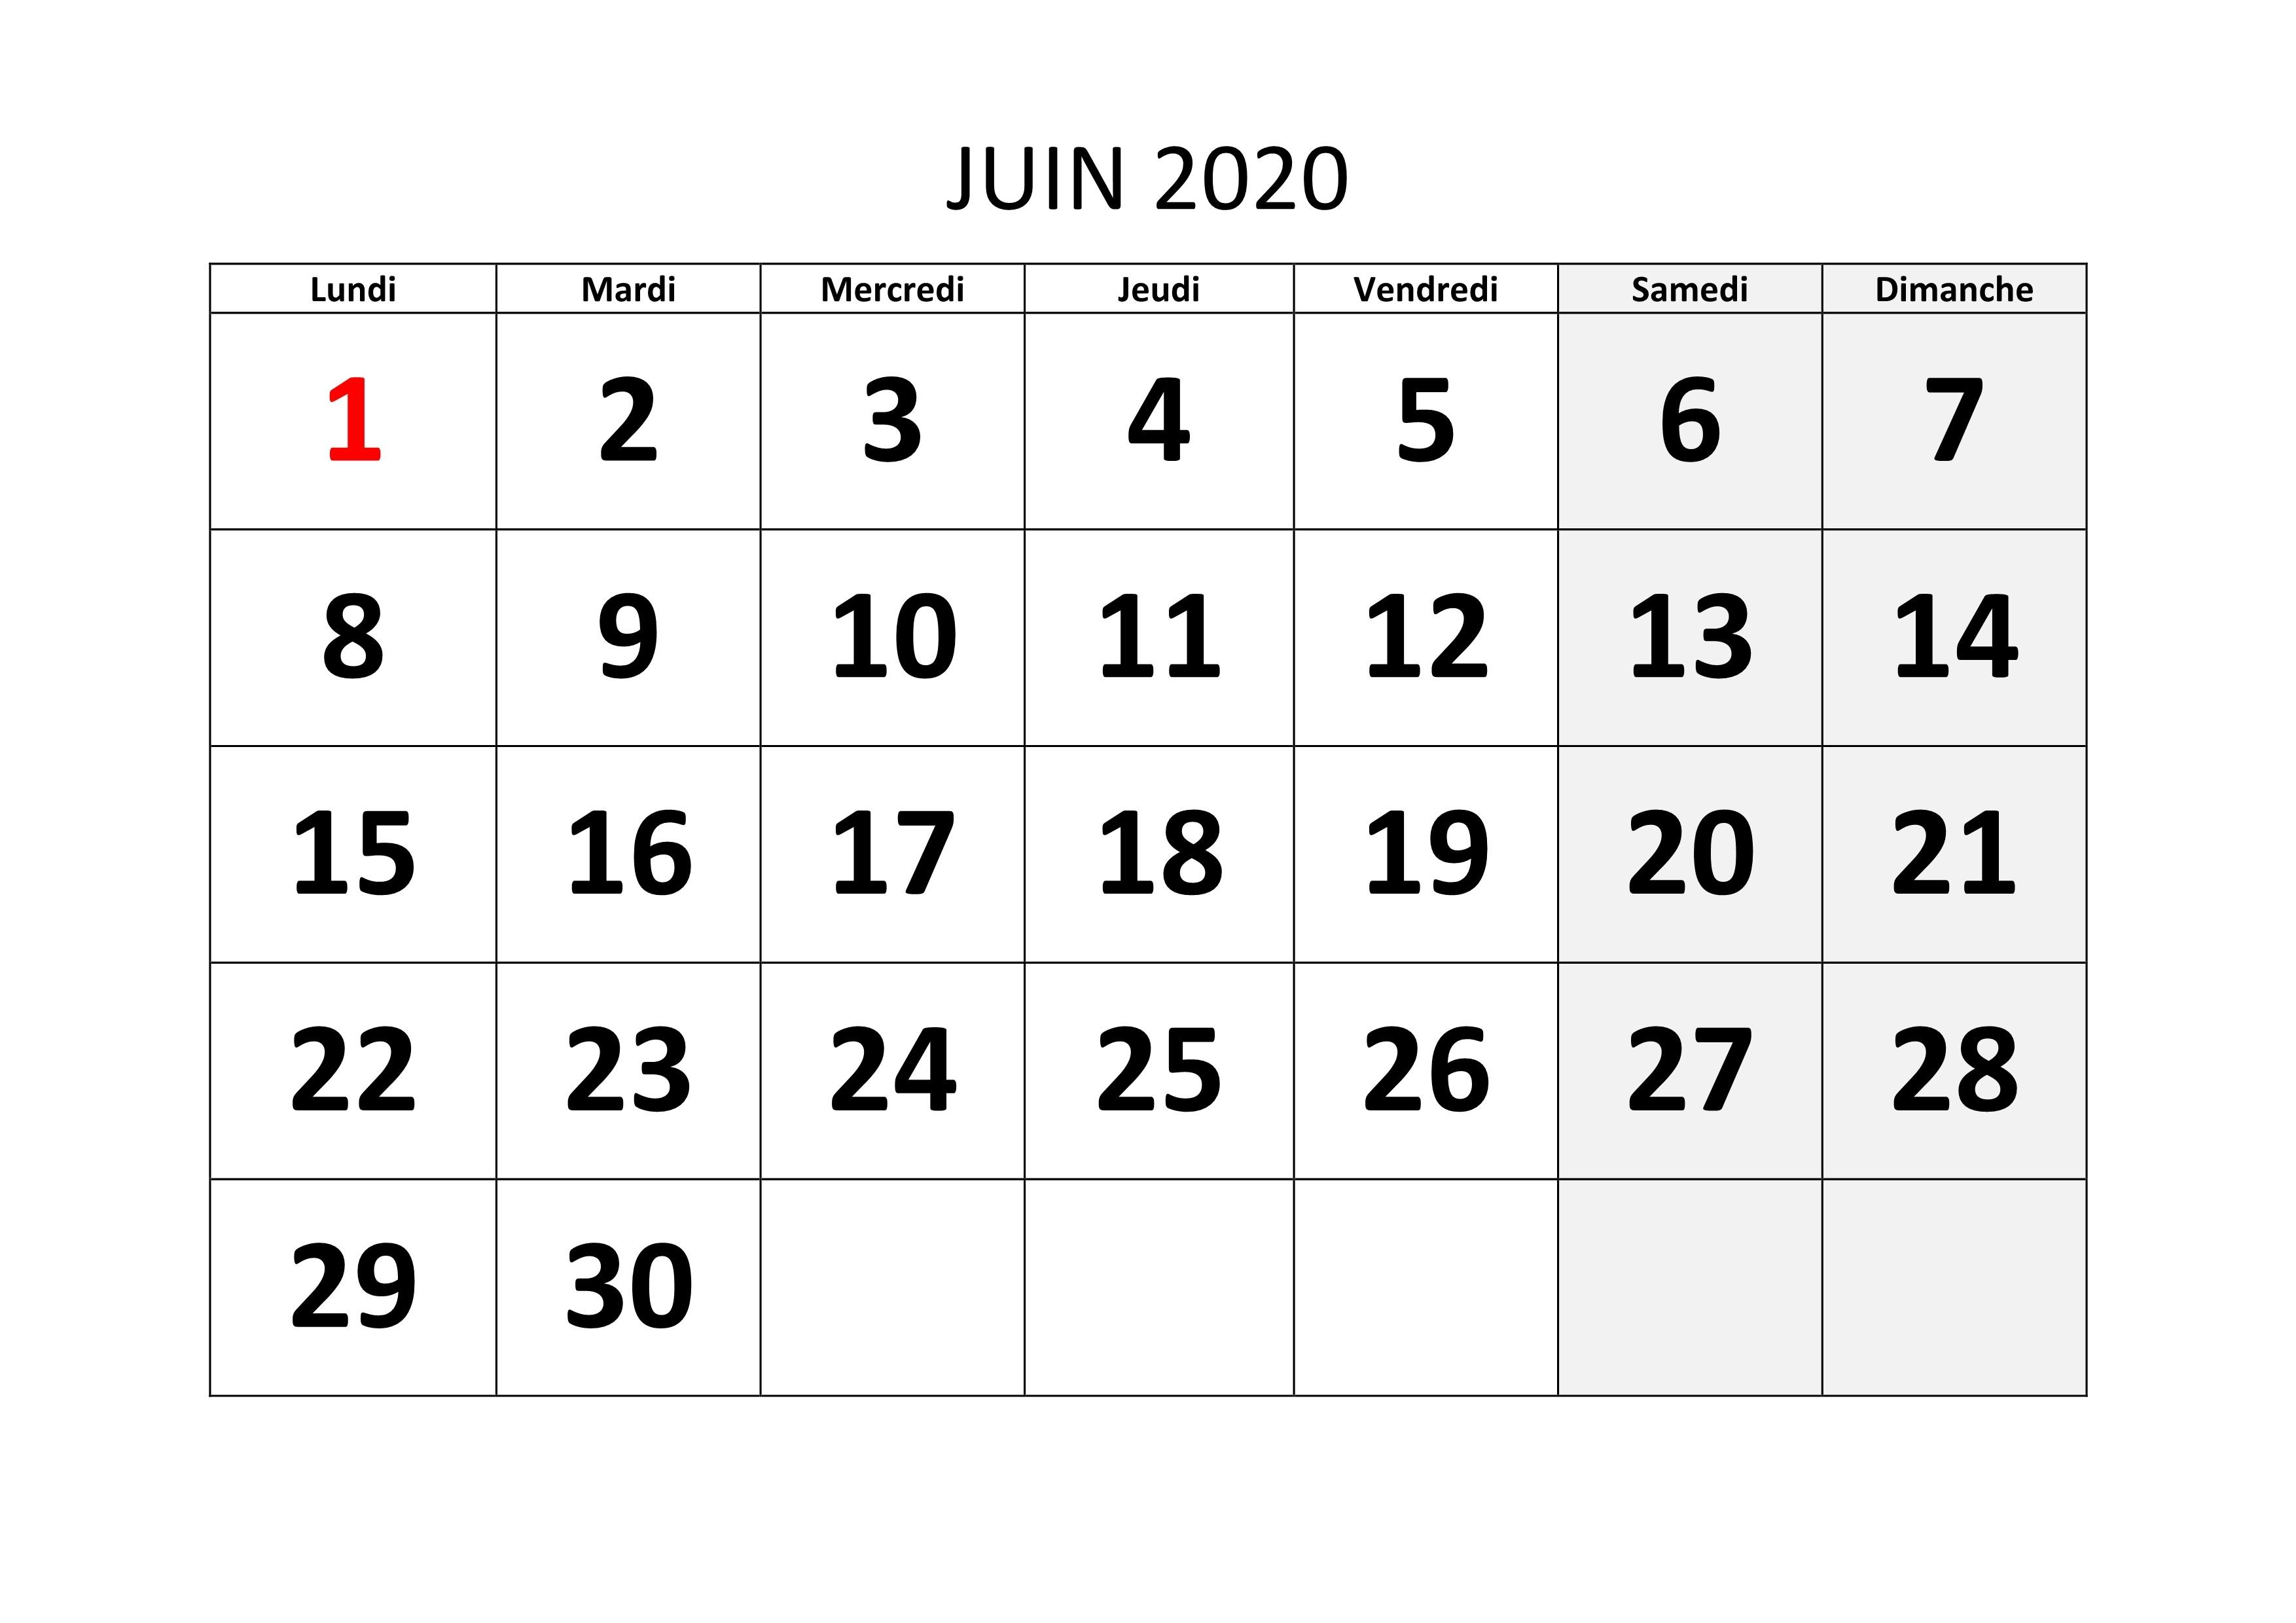 Calendrier Juin 2020